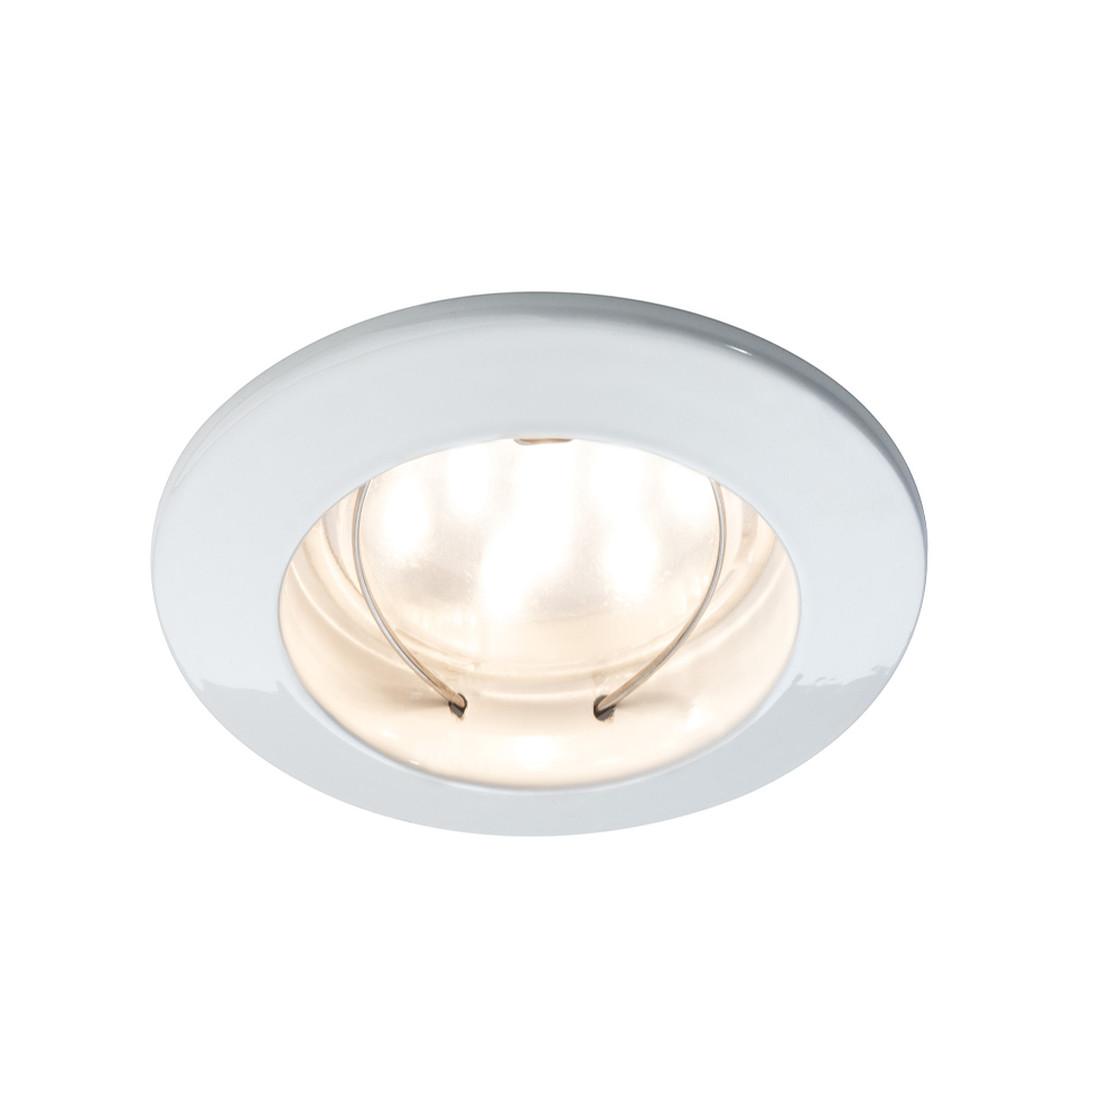 b15d led dimmbar led leuchtmittel warmwei f r artemide. Black Bedroom Furniture Sets. Home Design Ideas